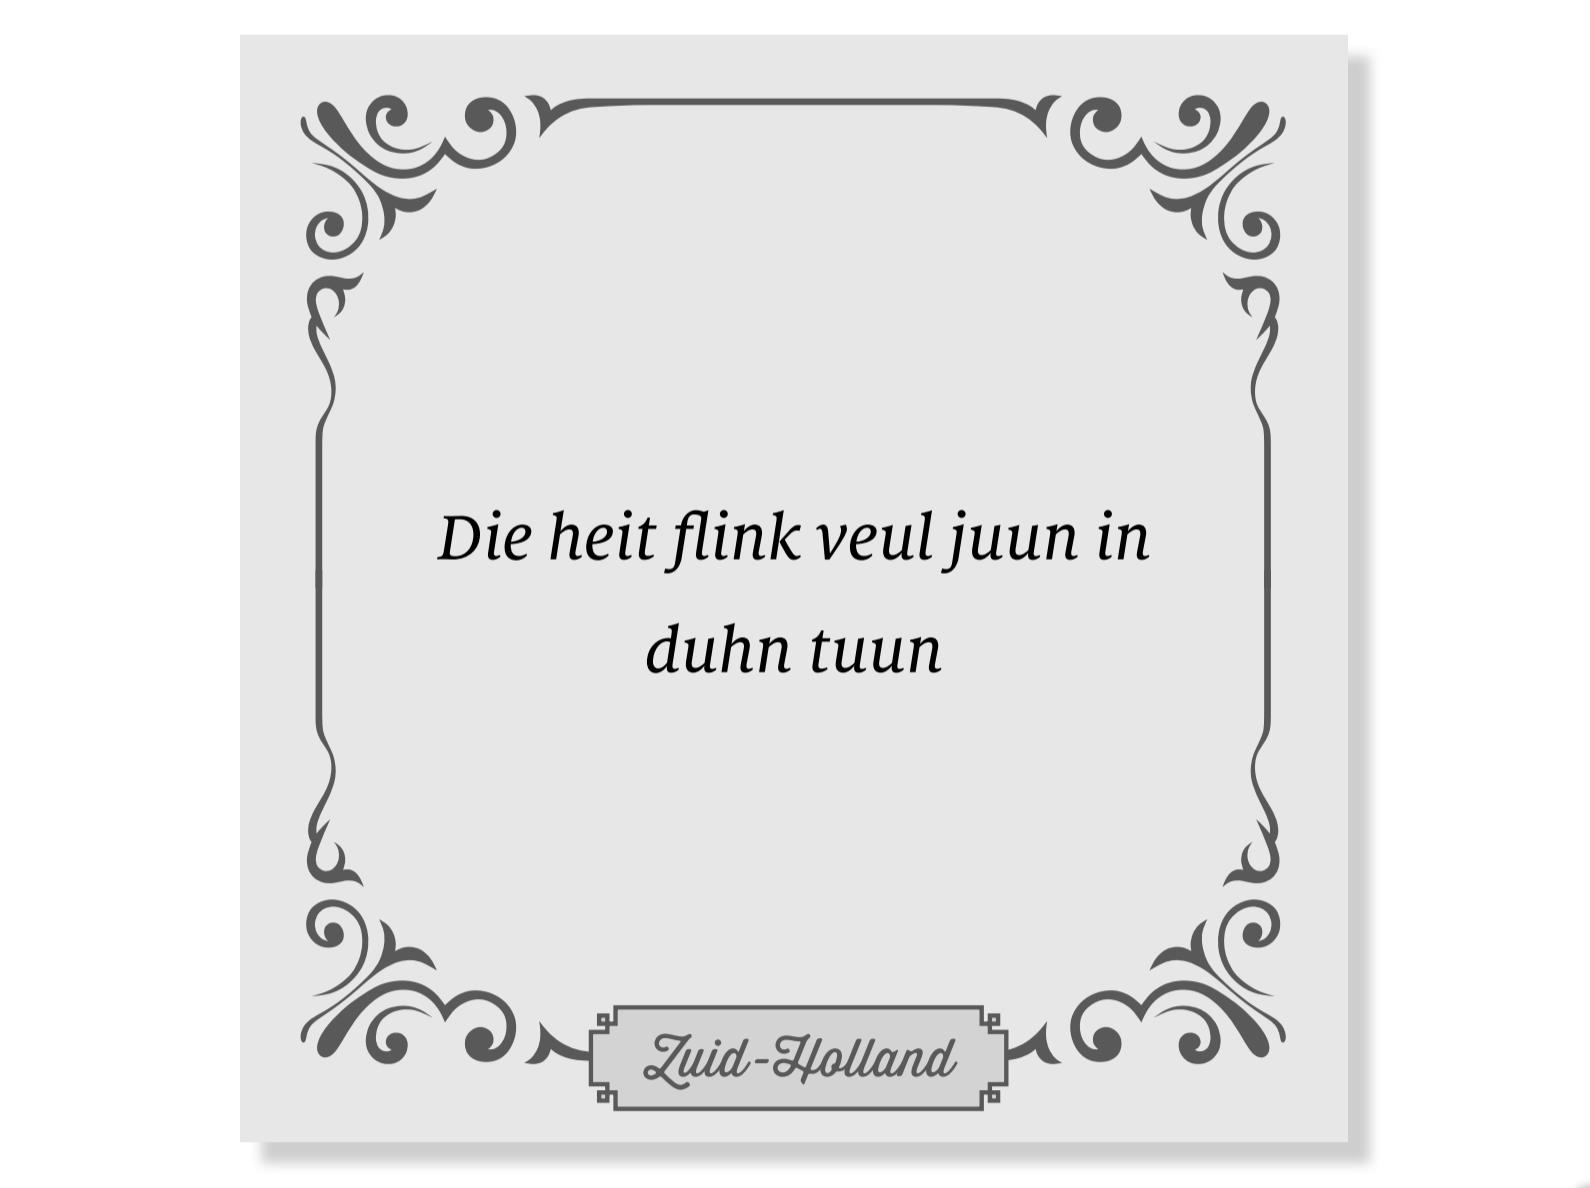 Brabantse Spreekwoorden En Gezegden CHX81